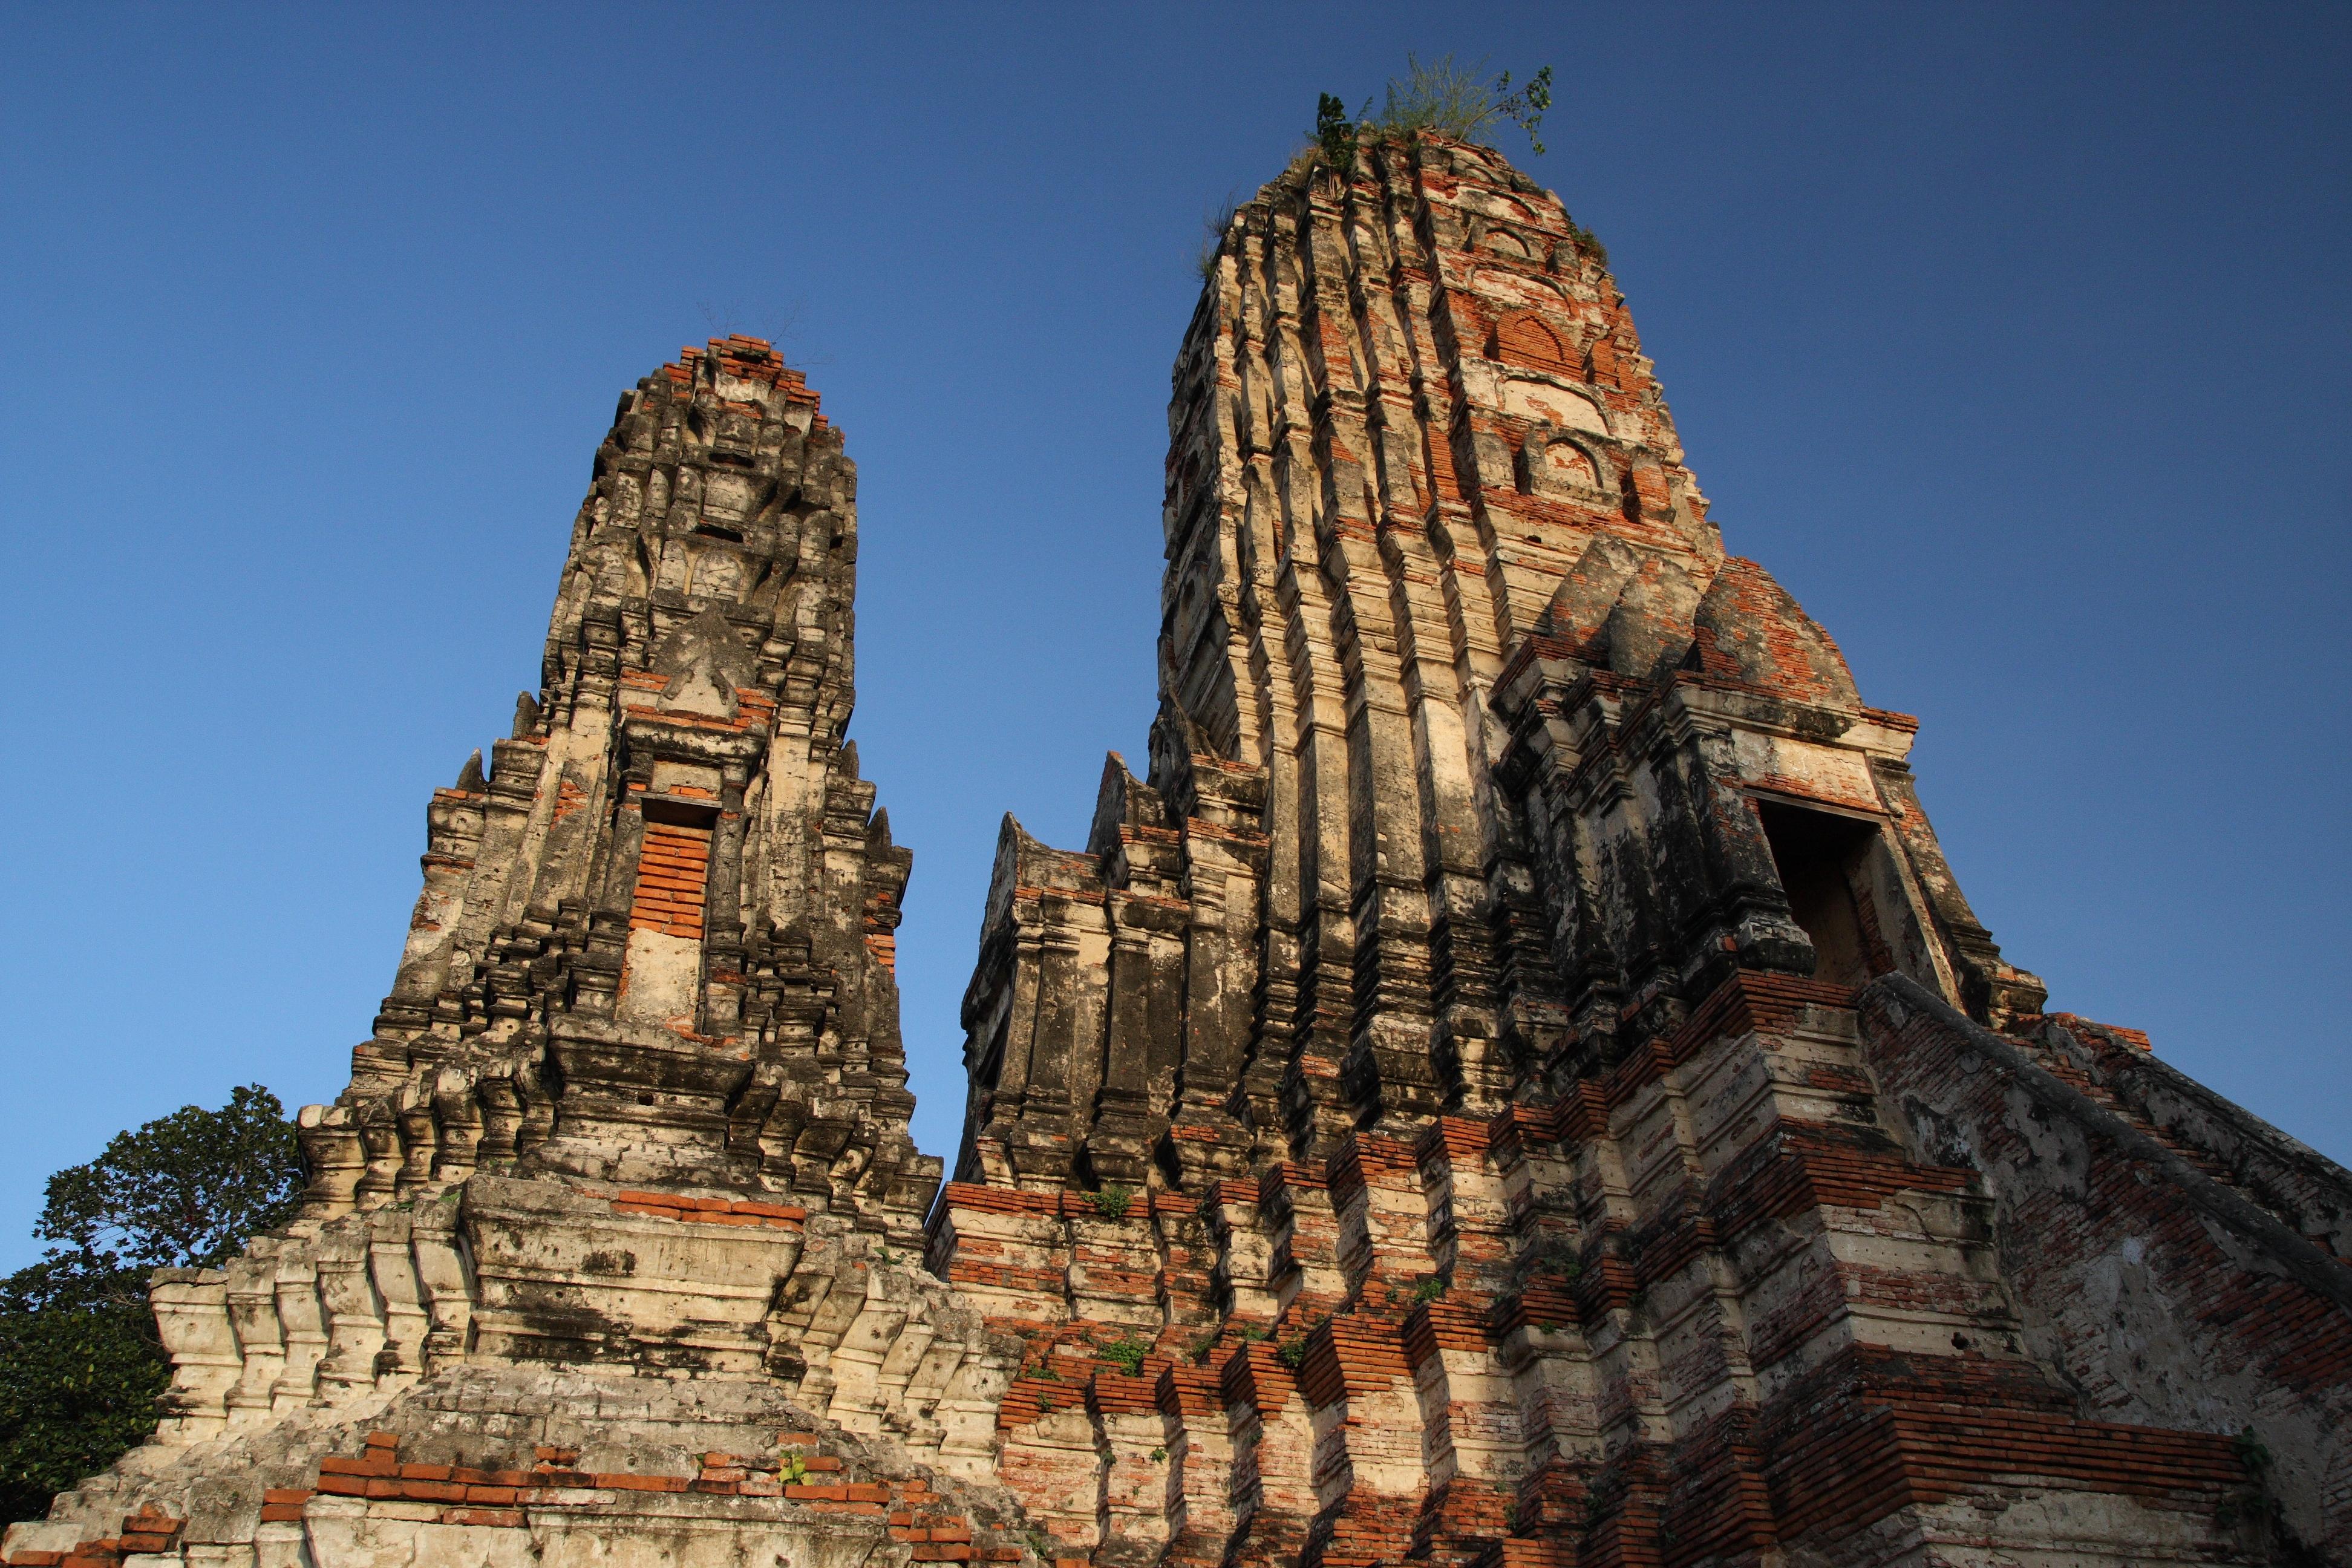 File:Wat Chaiwatthanaram, Ayutthaya, Thailand (5257475838 ...